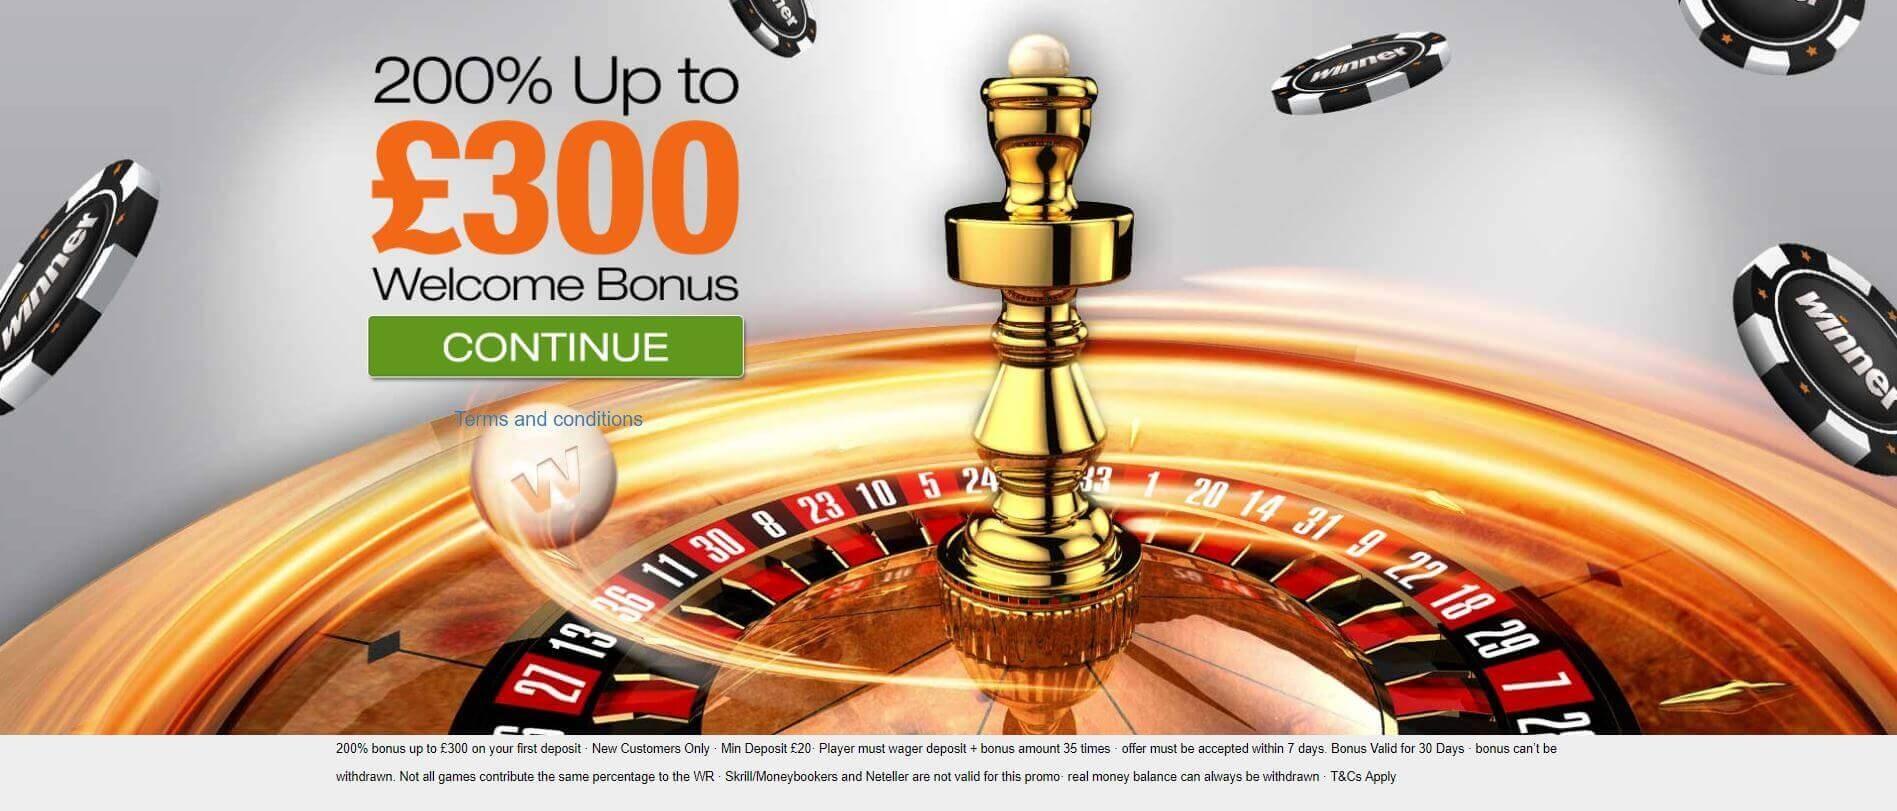 £3325 No deposit bonus code at Mansion Casino